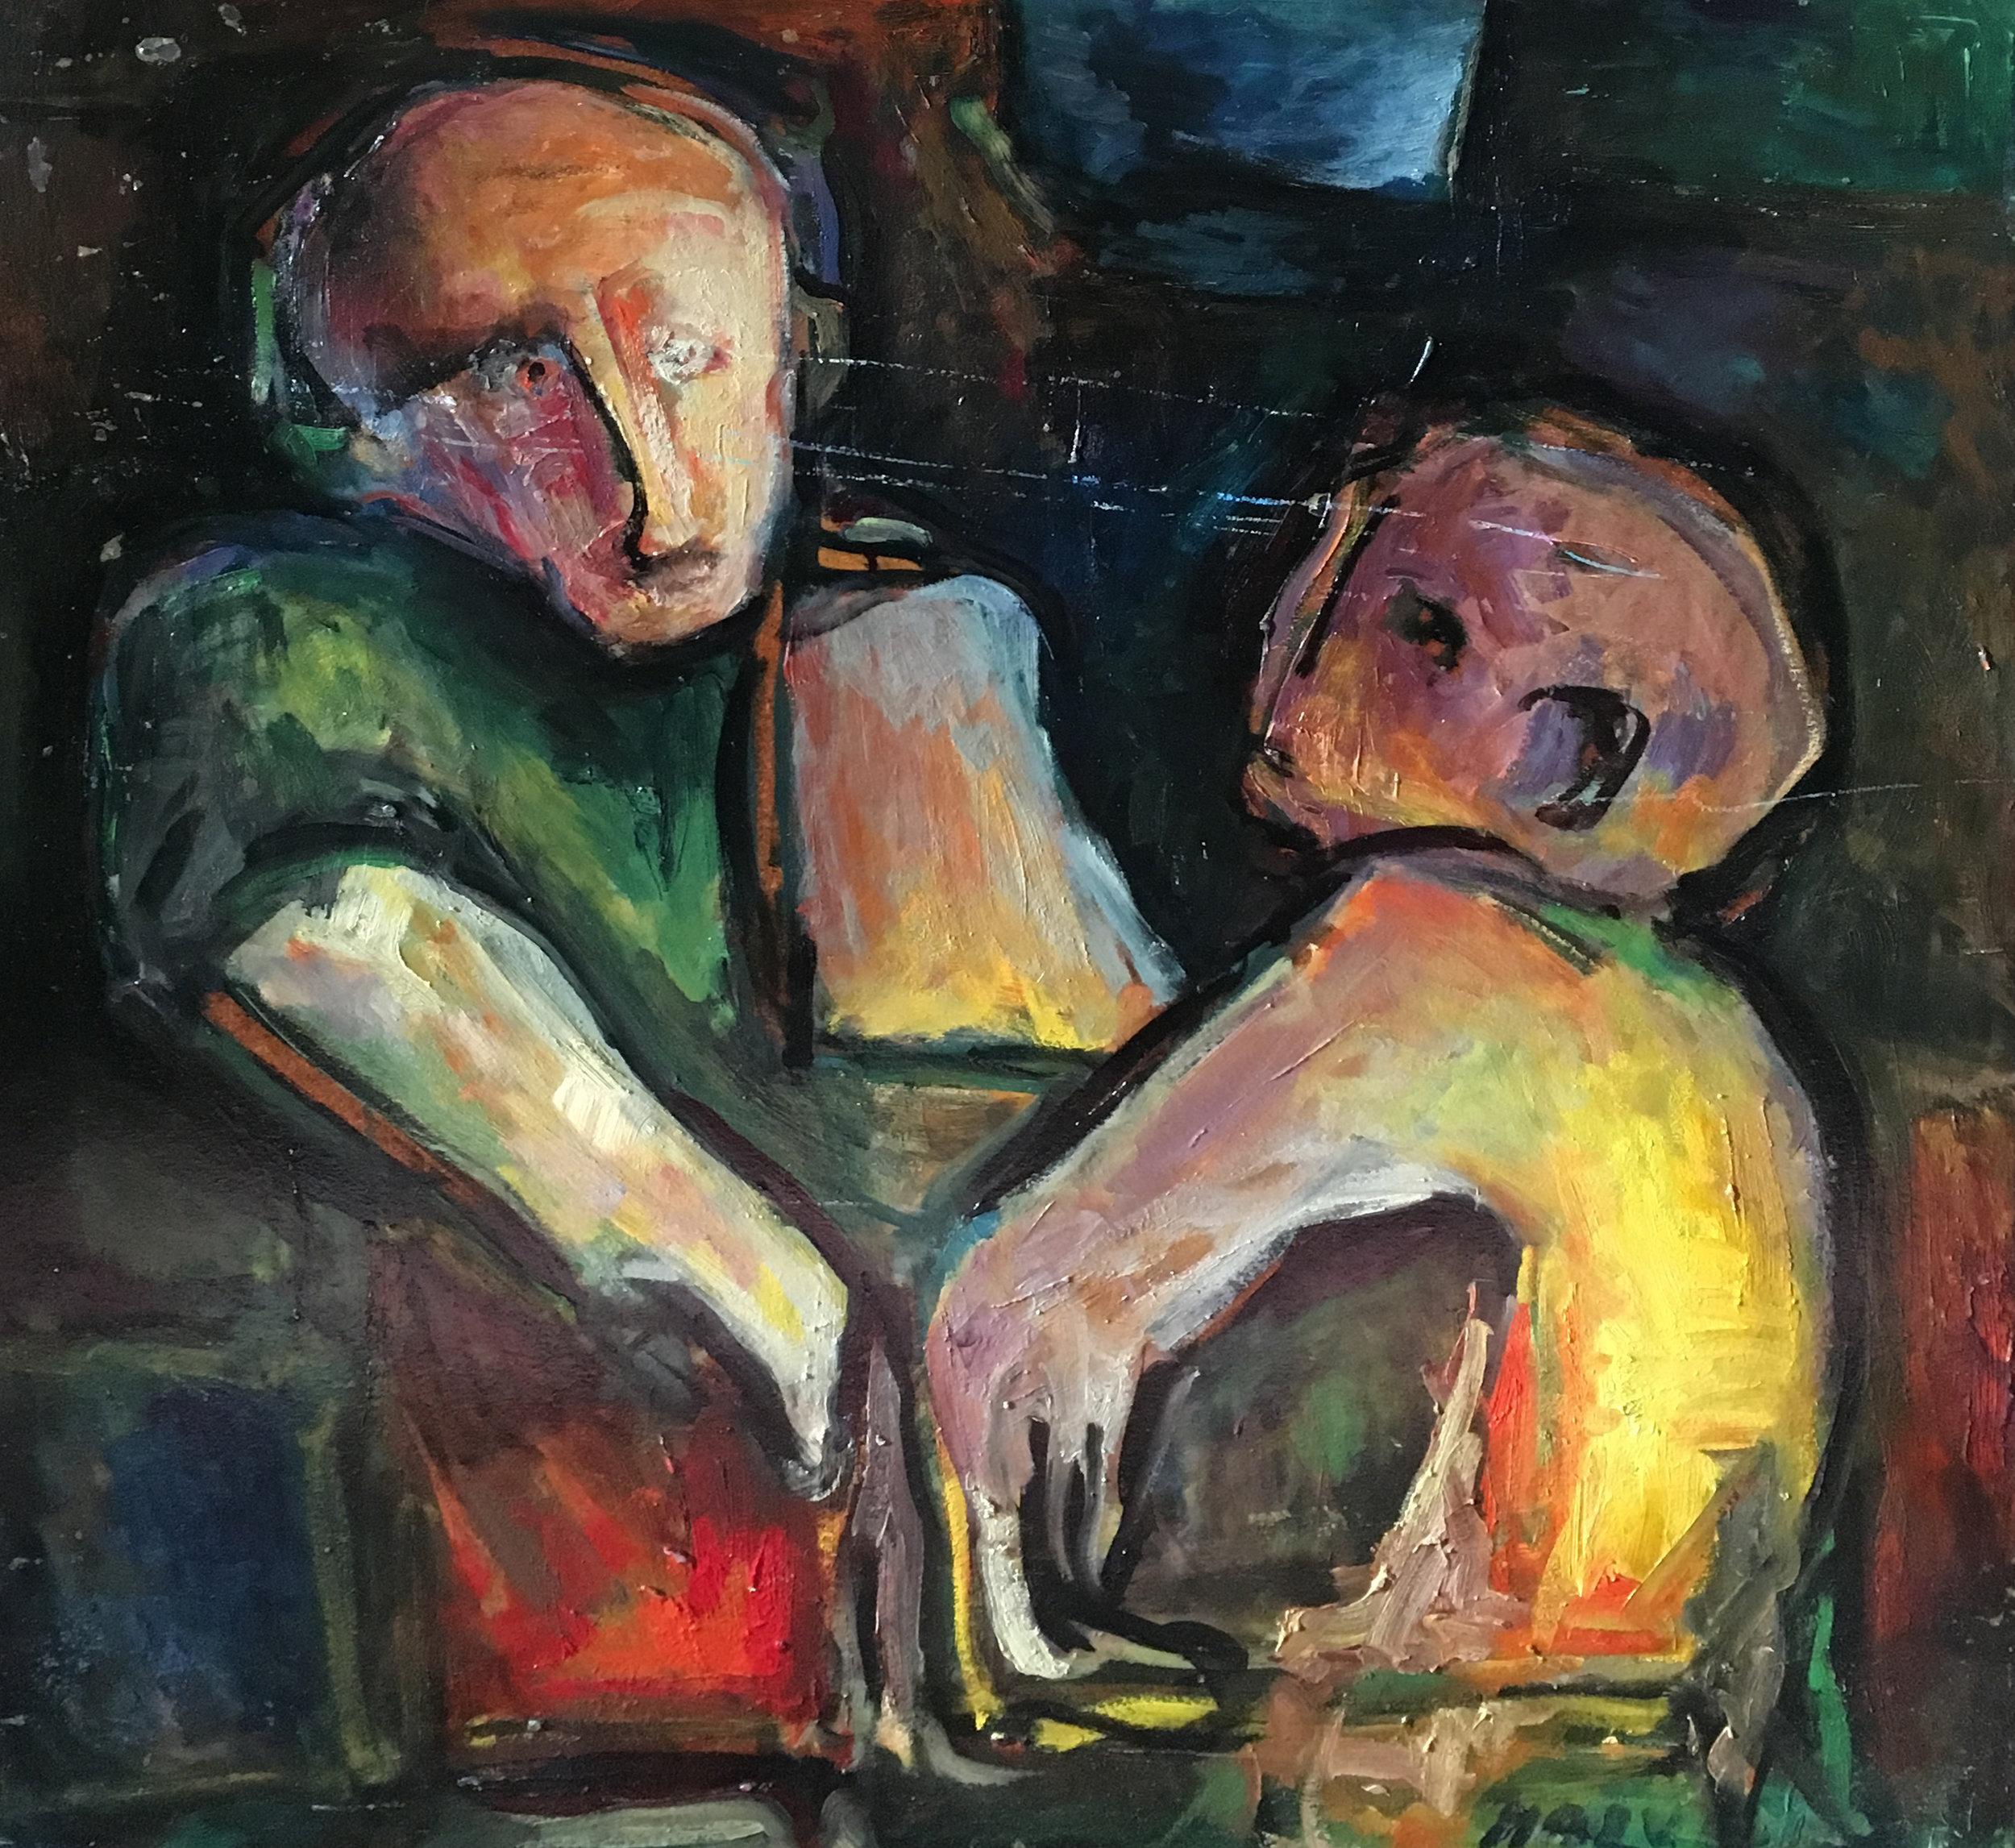 <b>Figures with dark background</b><br> (Orig. Figure con sfondo scuro) <br> 1974 Oil on wood <br> cm 70 x 73